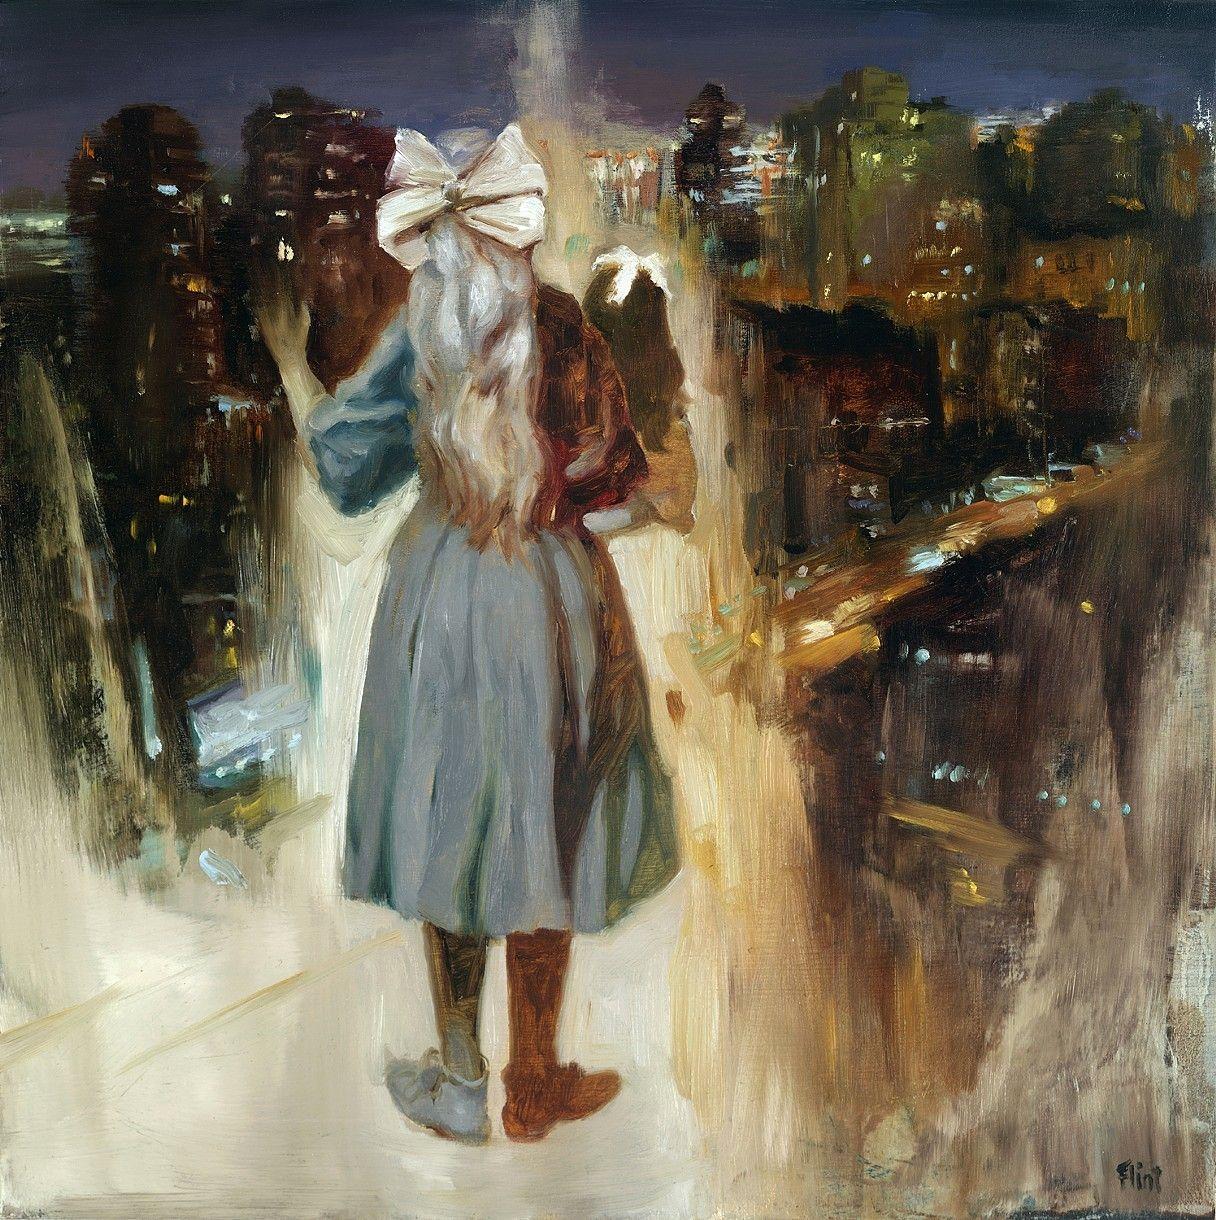 Joshua Flint 10 x10 oil painting Dollhouse III | Fig URE